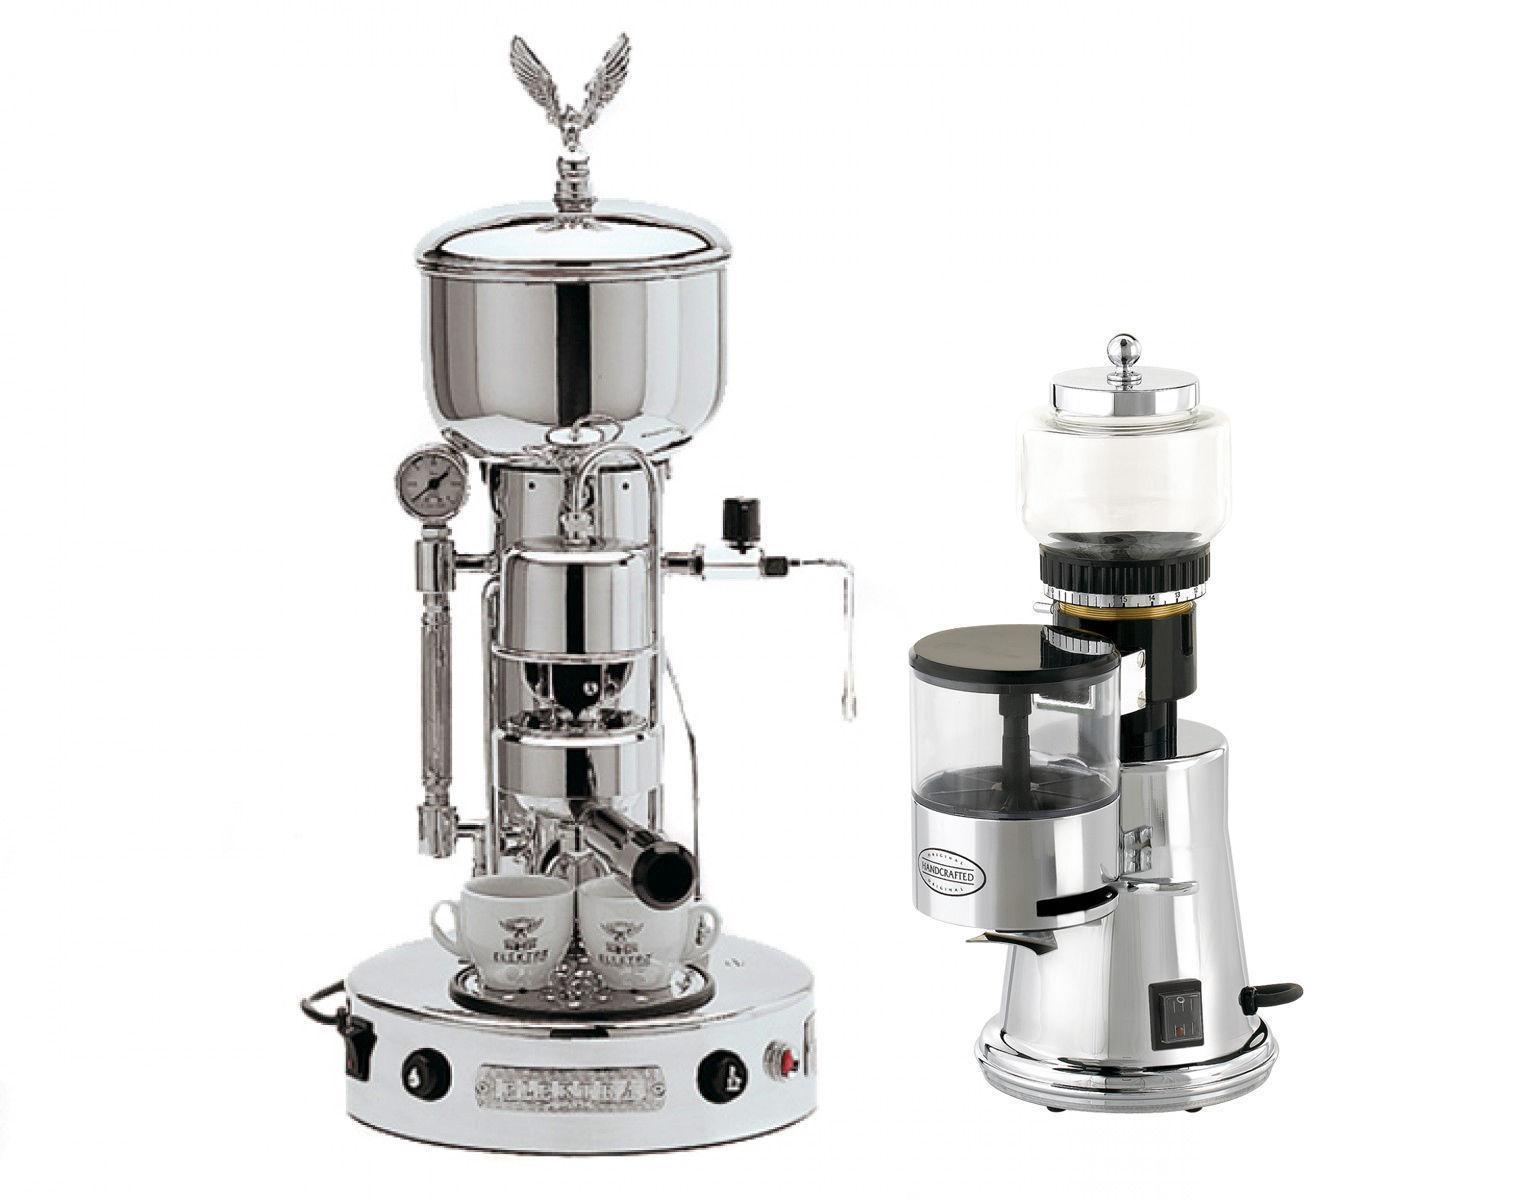 Elektra Semiautomatica Microcasa Machine+Grinder MS Italian Espresso Set 220V